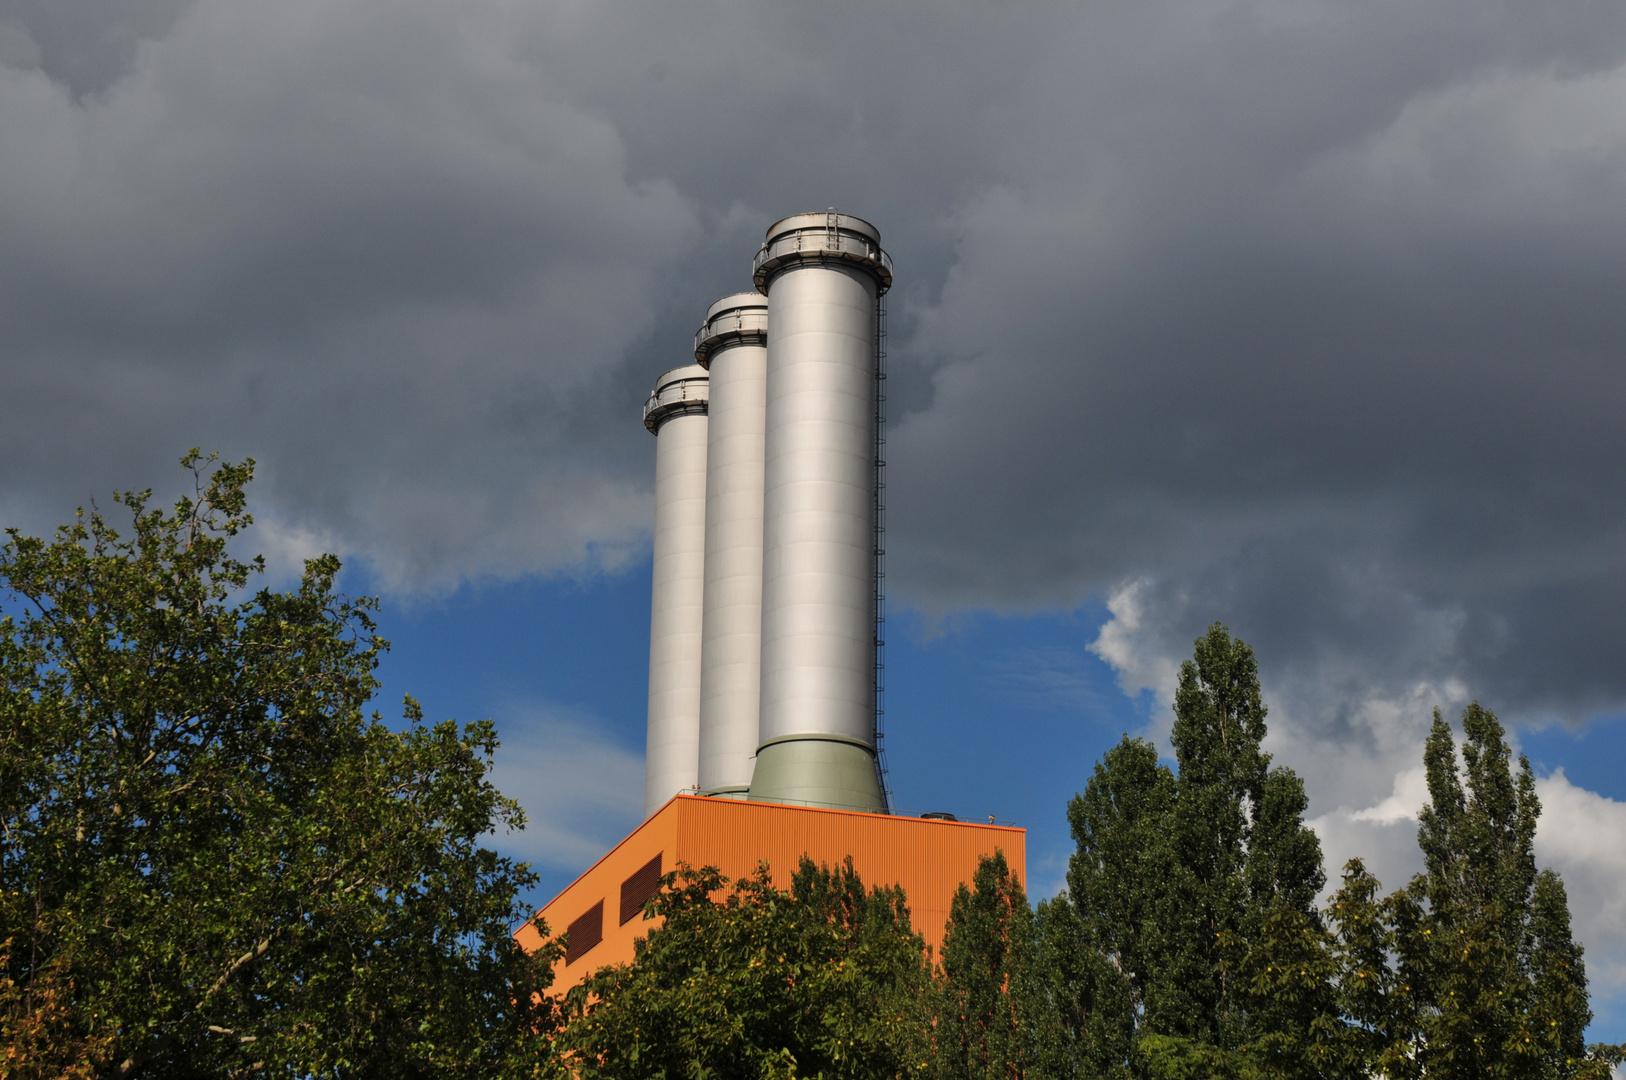 Industrieanlage Am Spreebord, Berlin